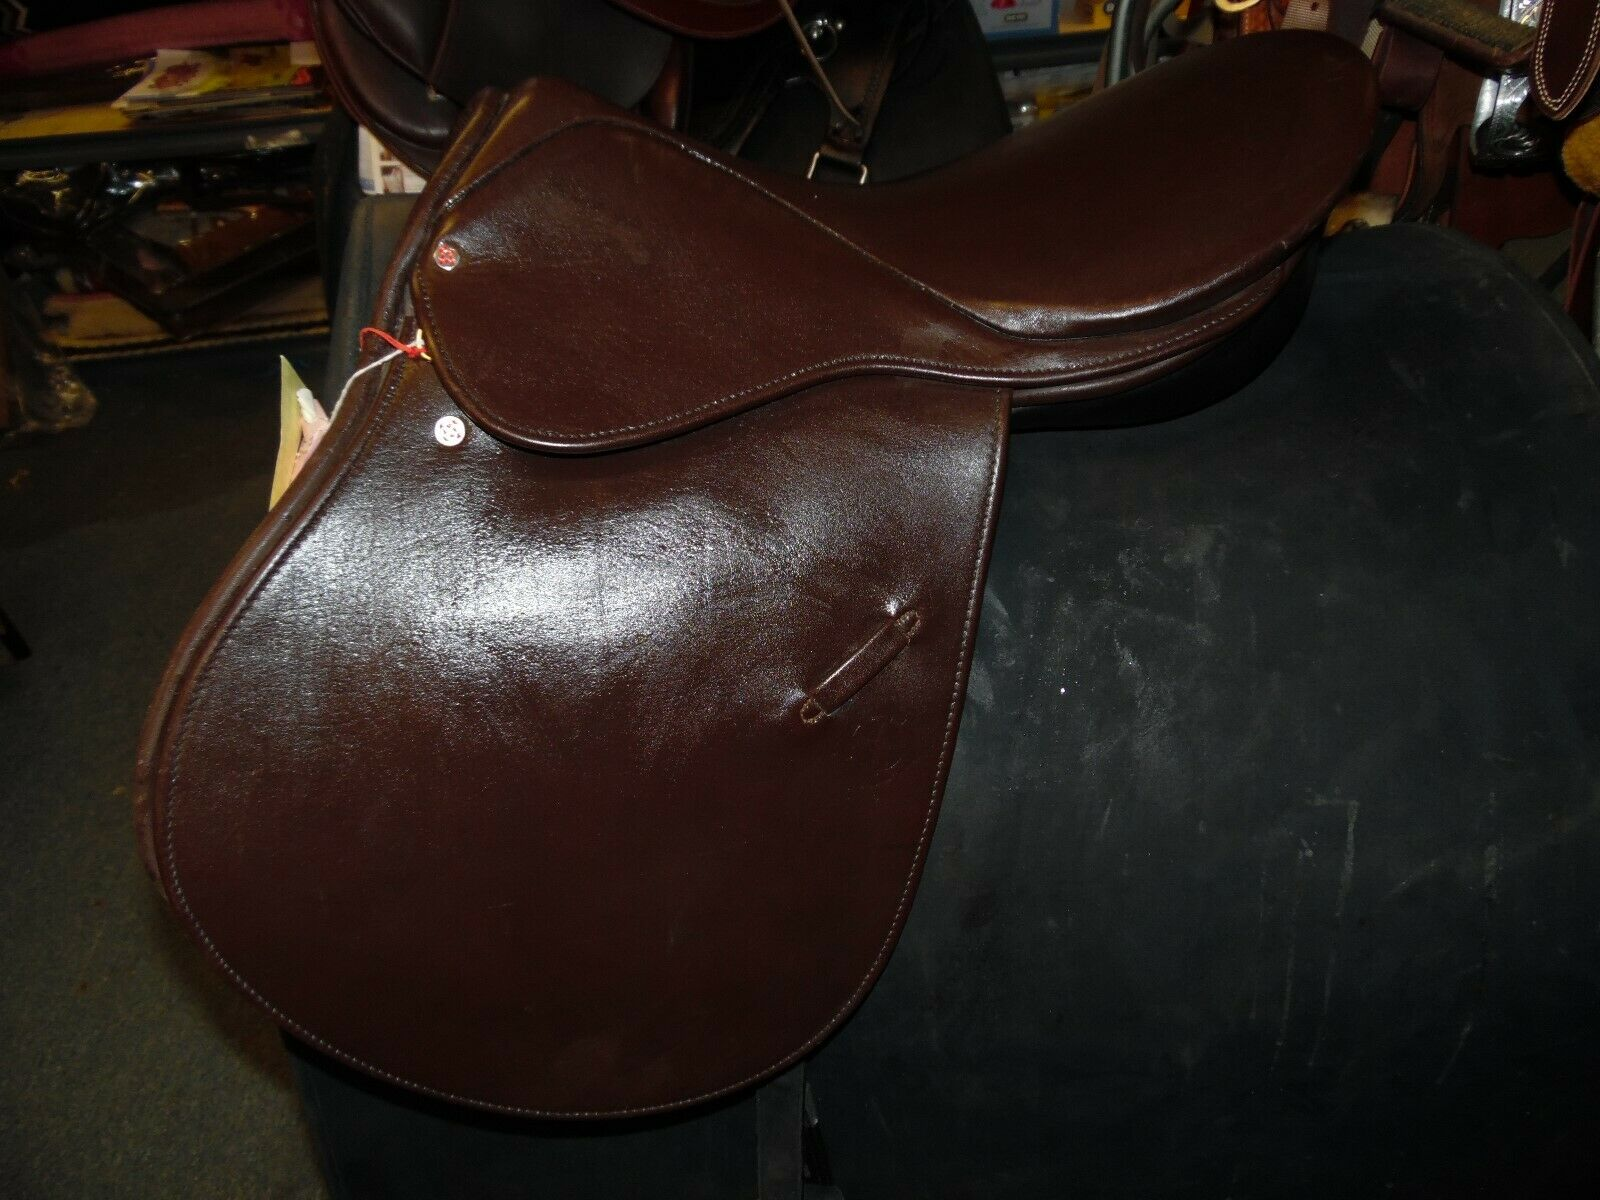 Courbette Luxor VSS All Purpose English Saddle 17.5 seat 32cm tree